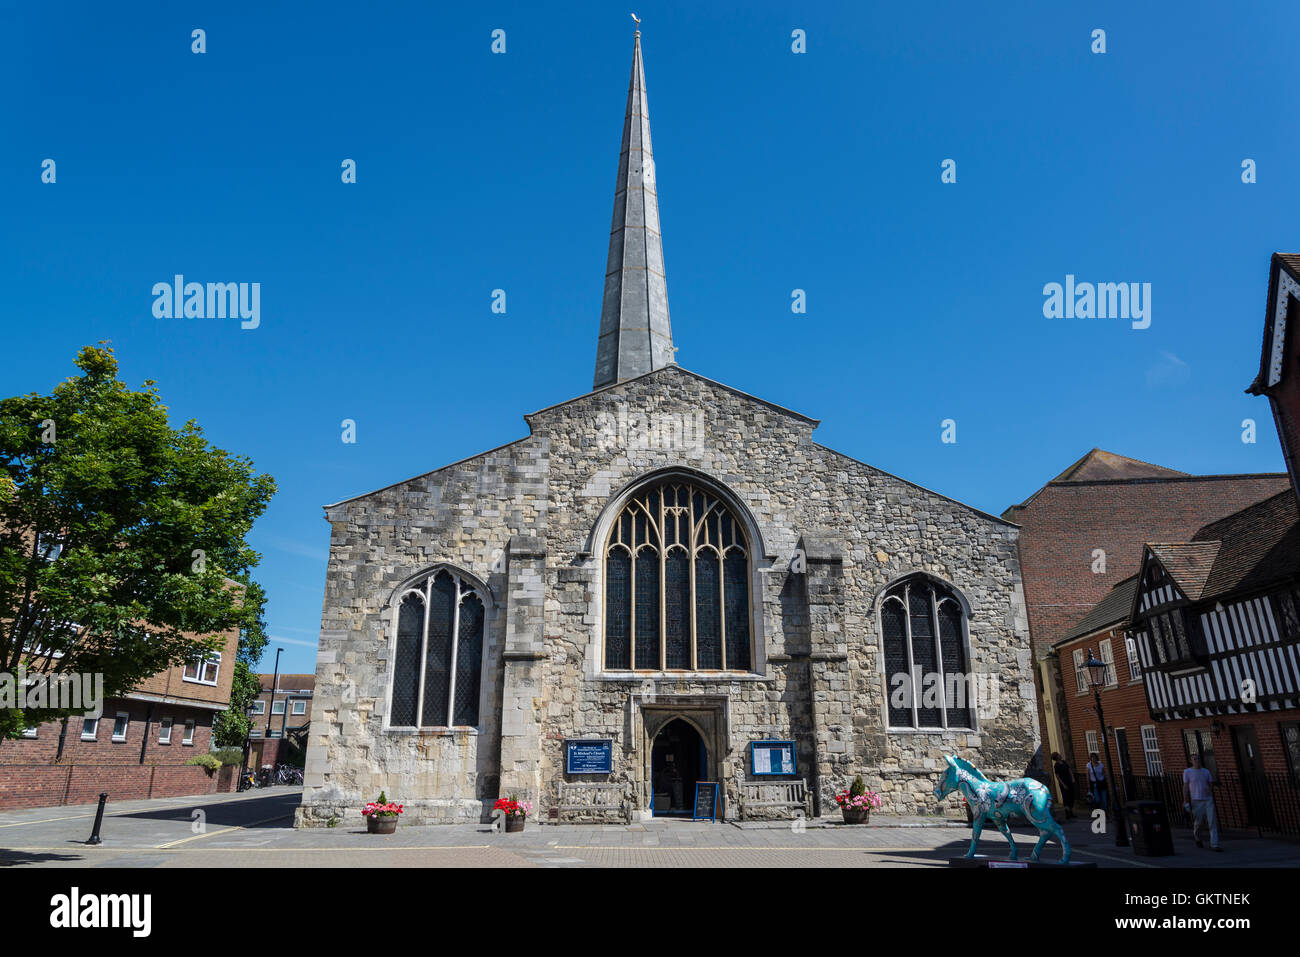 St Michael's Church, Southampton, Hampshire, England, UK - Stock Image